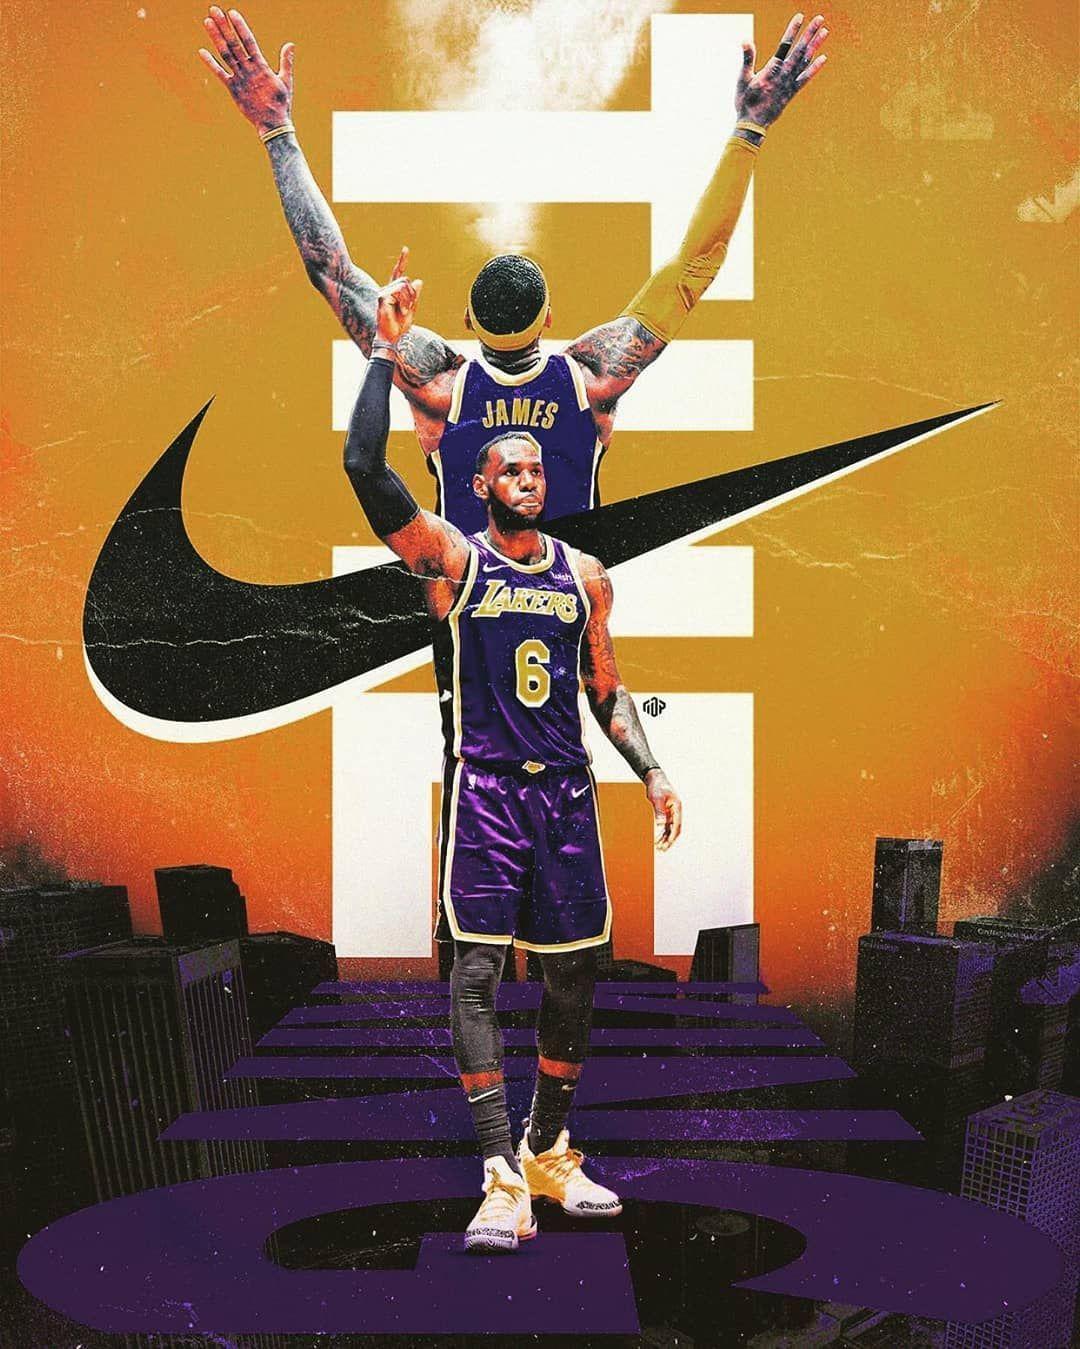 NBA 2020 Wallpapers - Wallpaper Cave